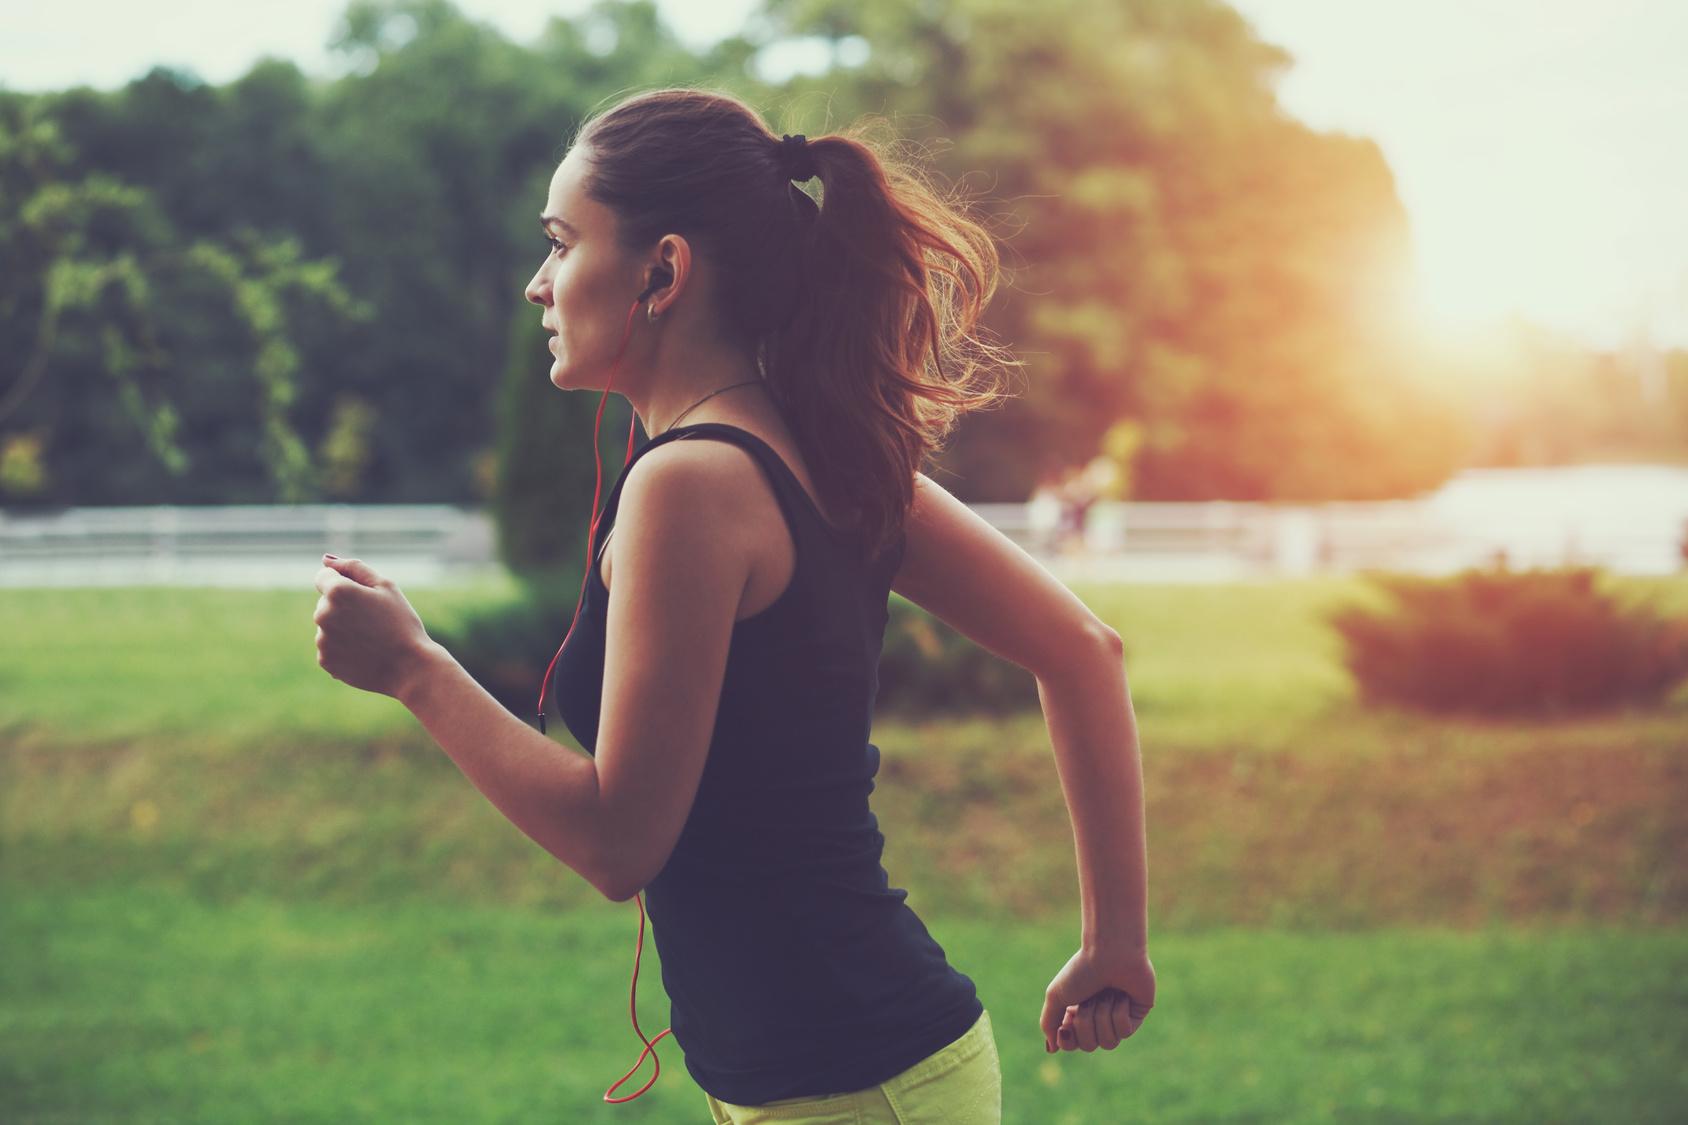 Frau joggt im Park bei Sonnenaufgang